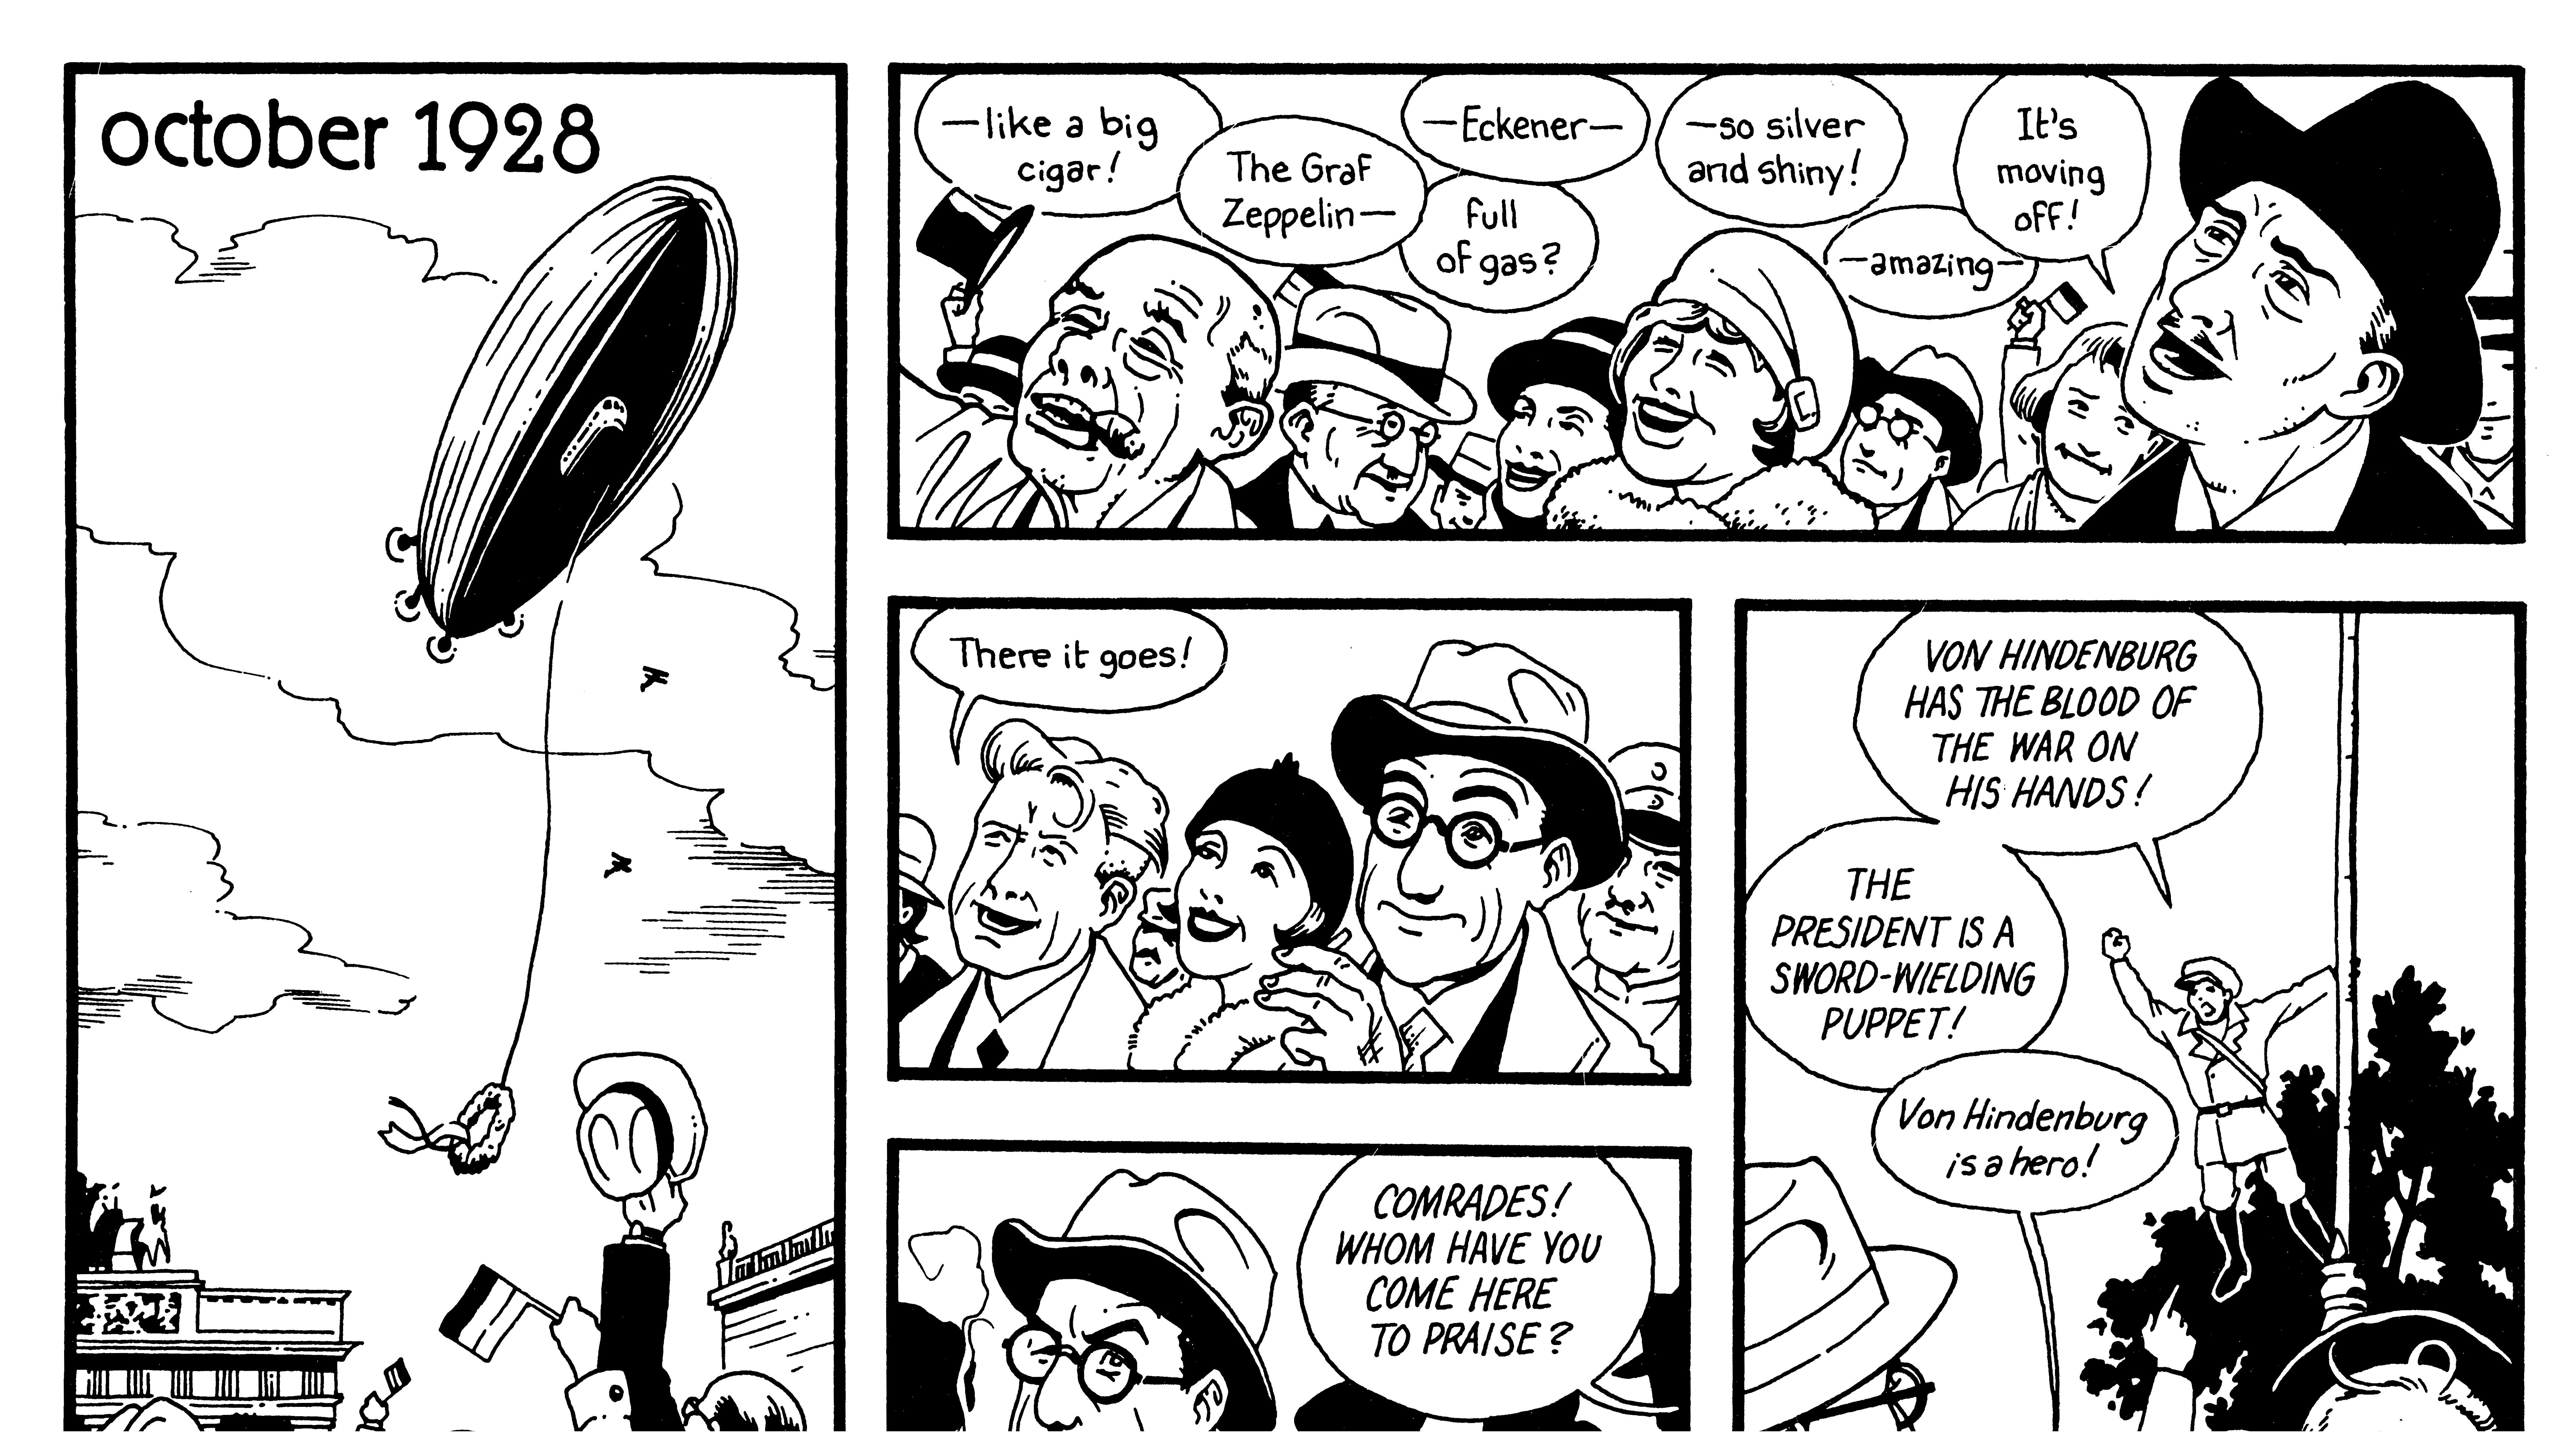 A comic depicting a blimp flight seen by spectators in Germany